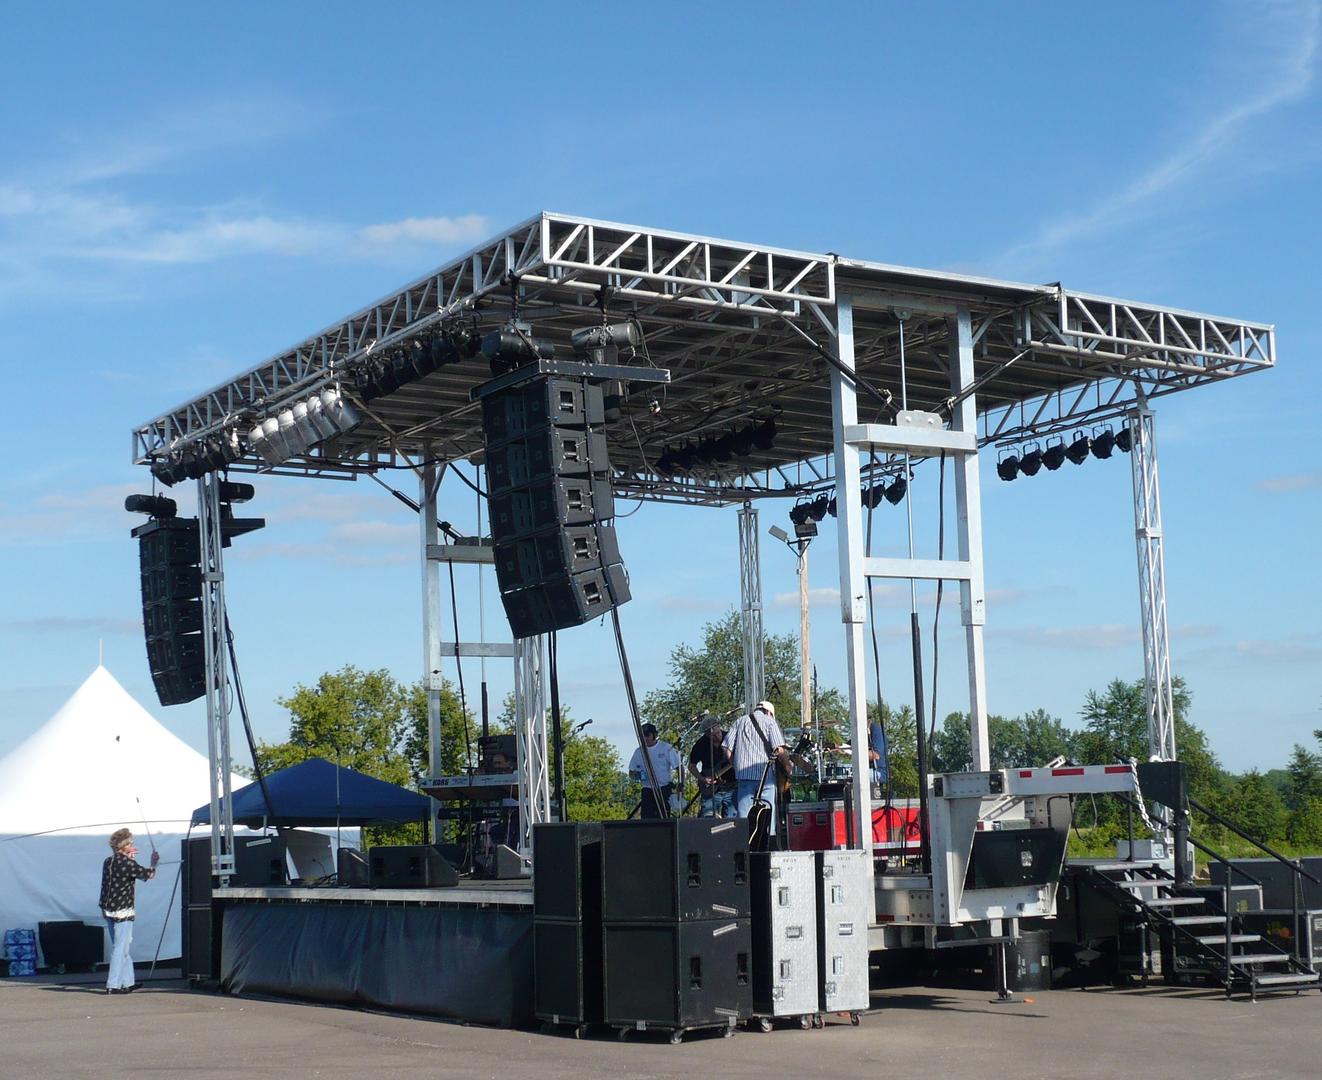 Festival Mobile Stage Rentals - Apex Mobile Stage Rentals, Apex 3224